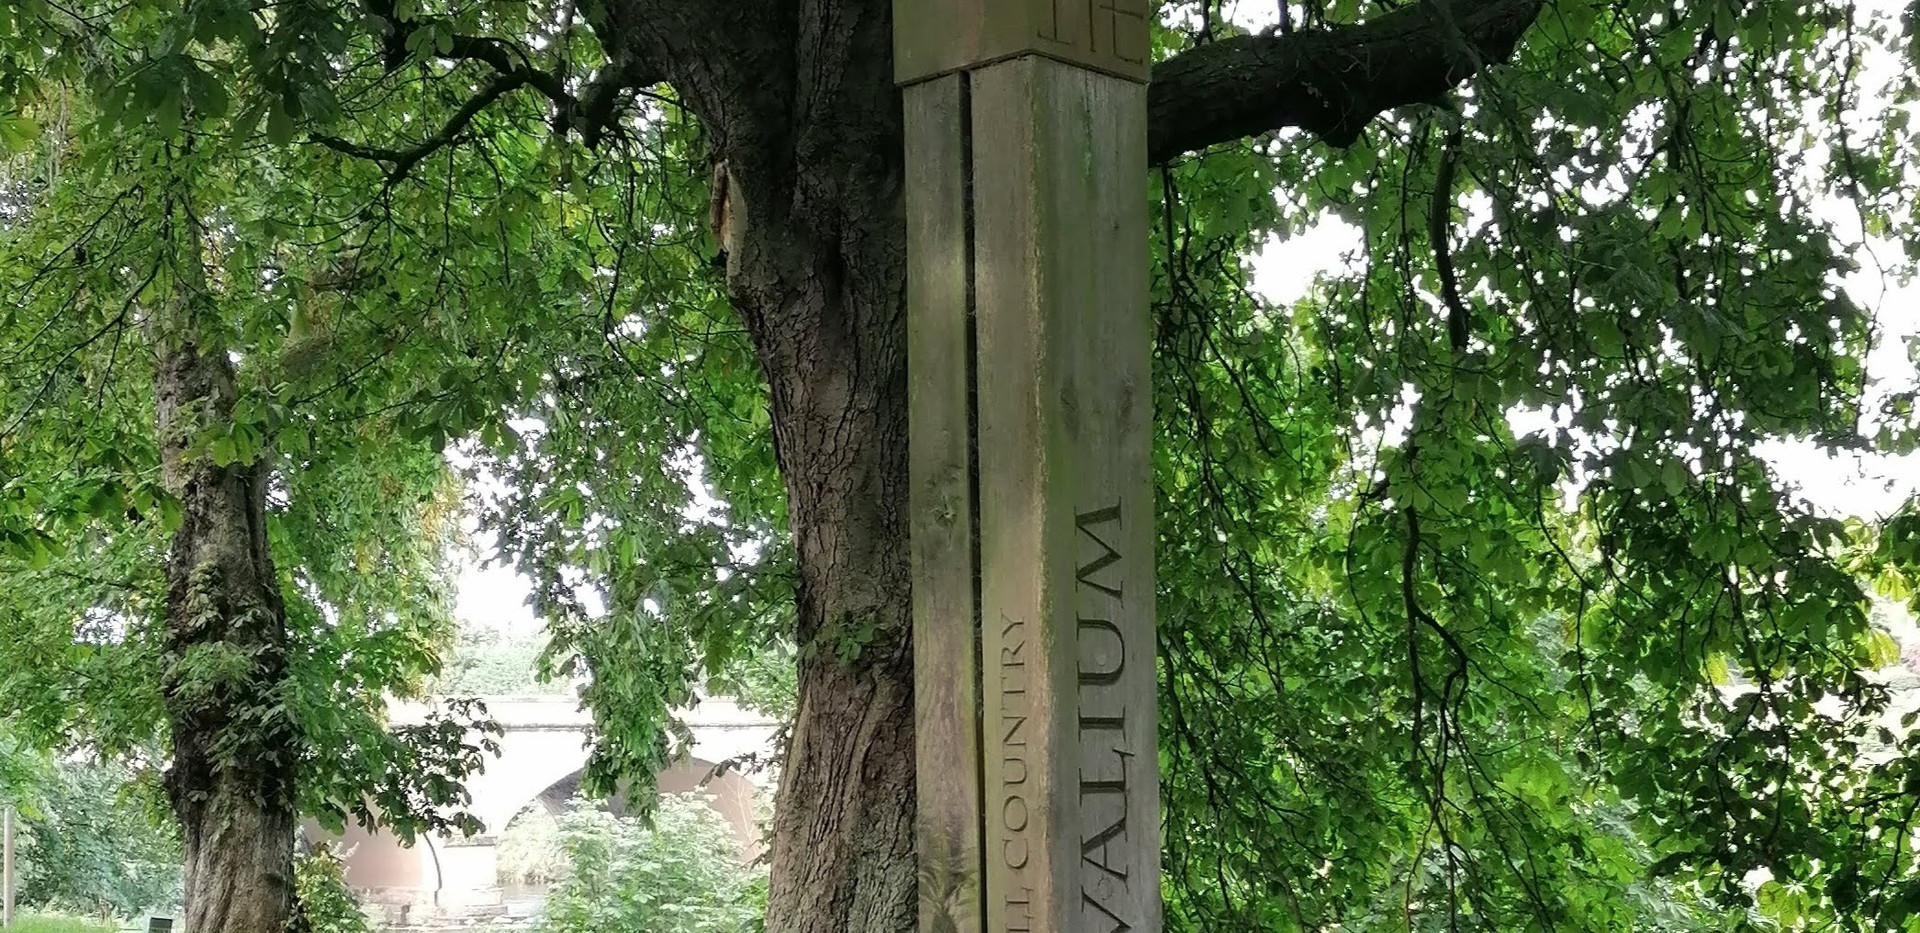 Signposting Within Bitts Park, Carlisle